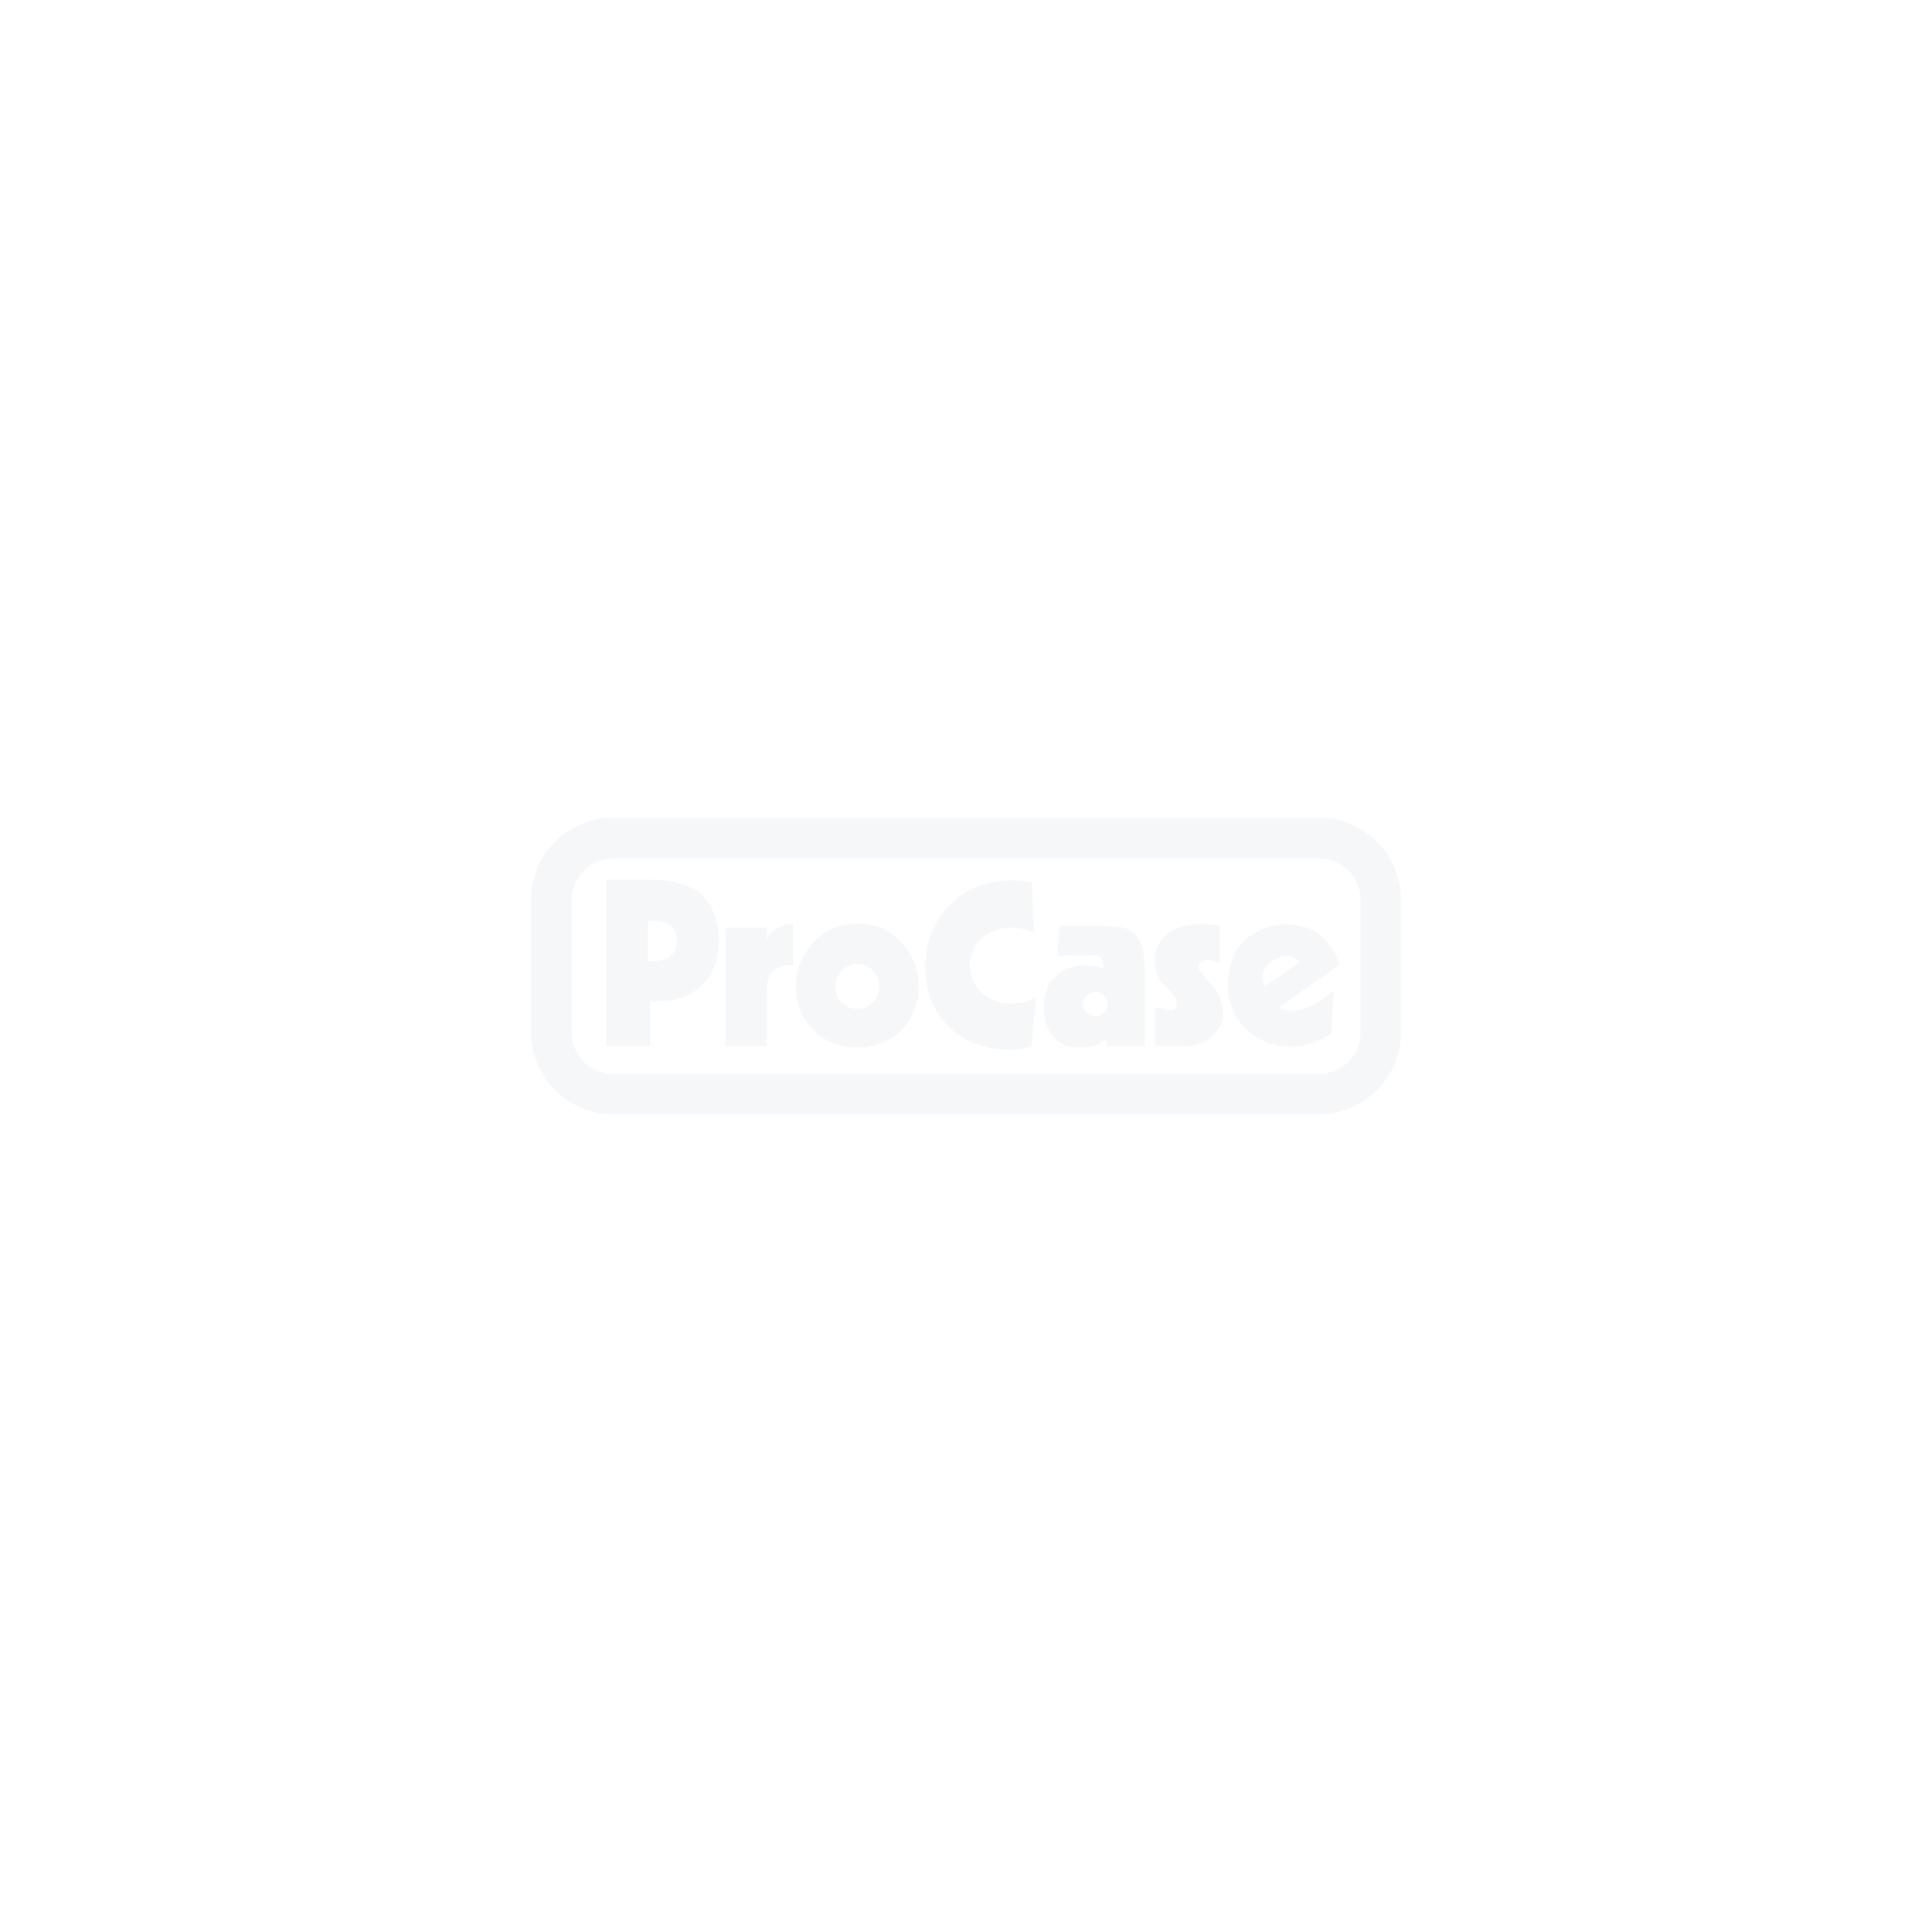 Flightcase für 2 d&b audiotechnik Y7P/Y10P